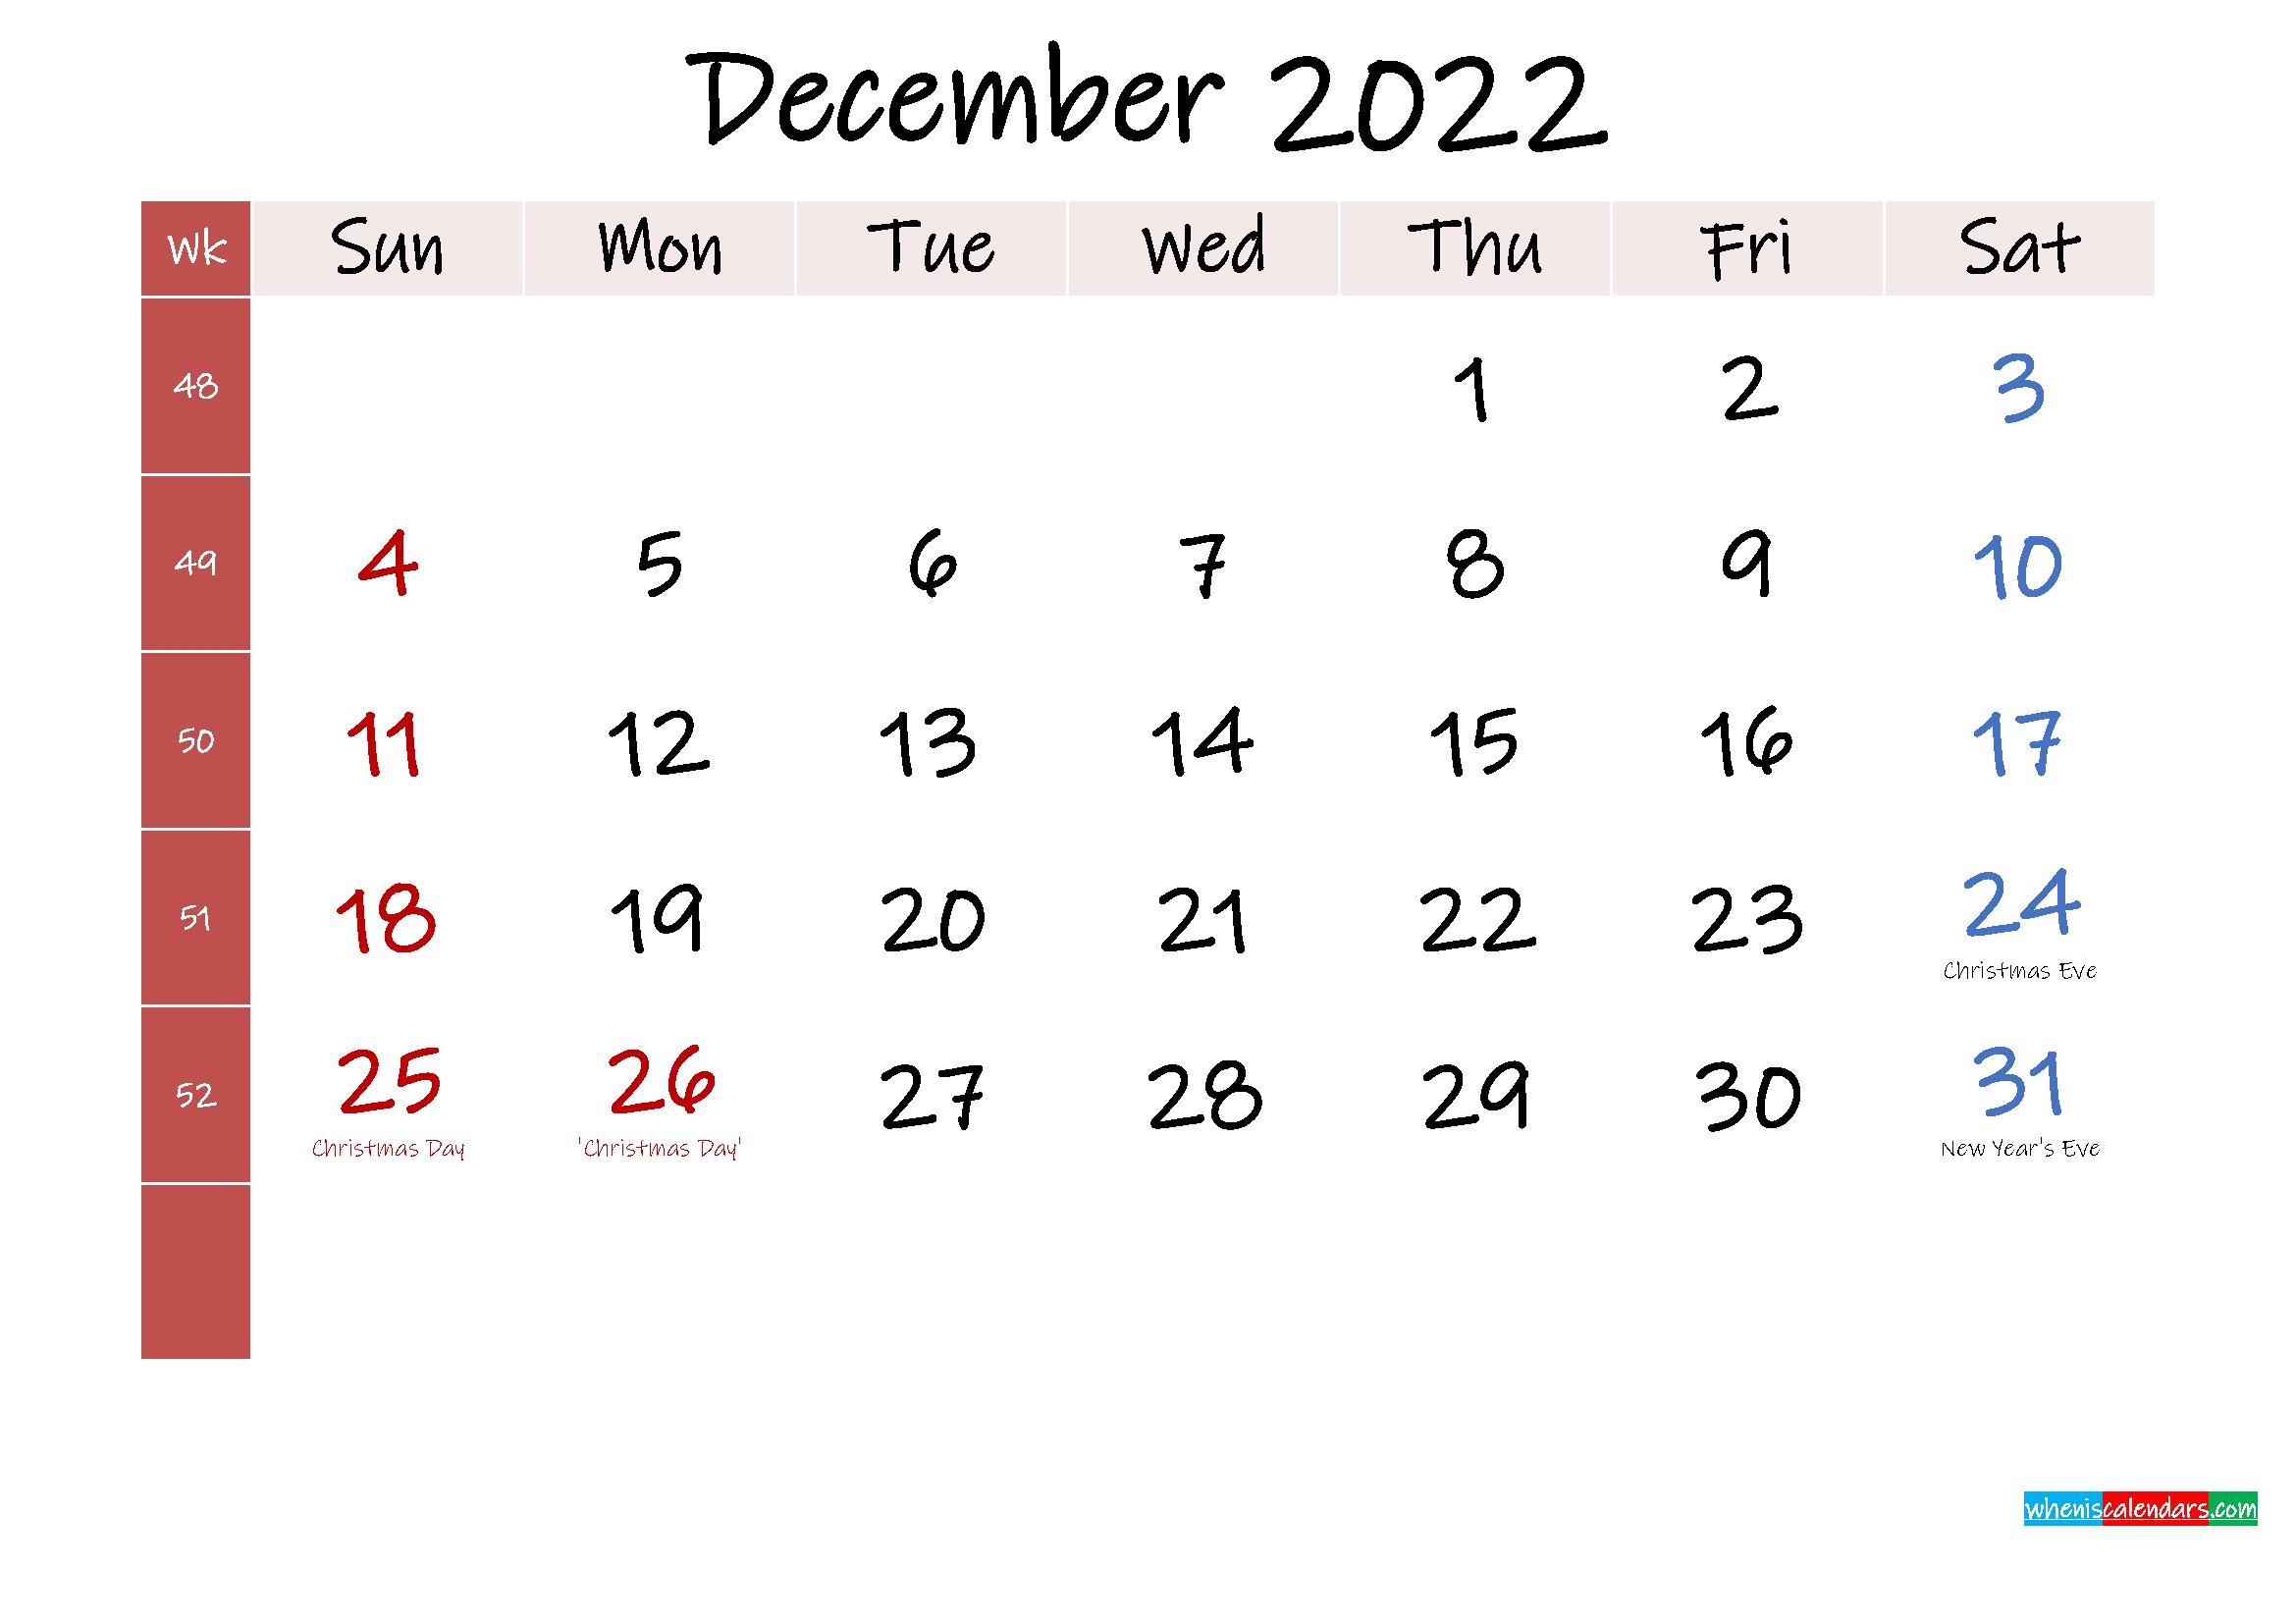 December 2022 Free Printable Calendar